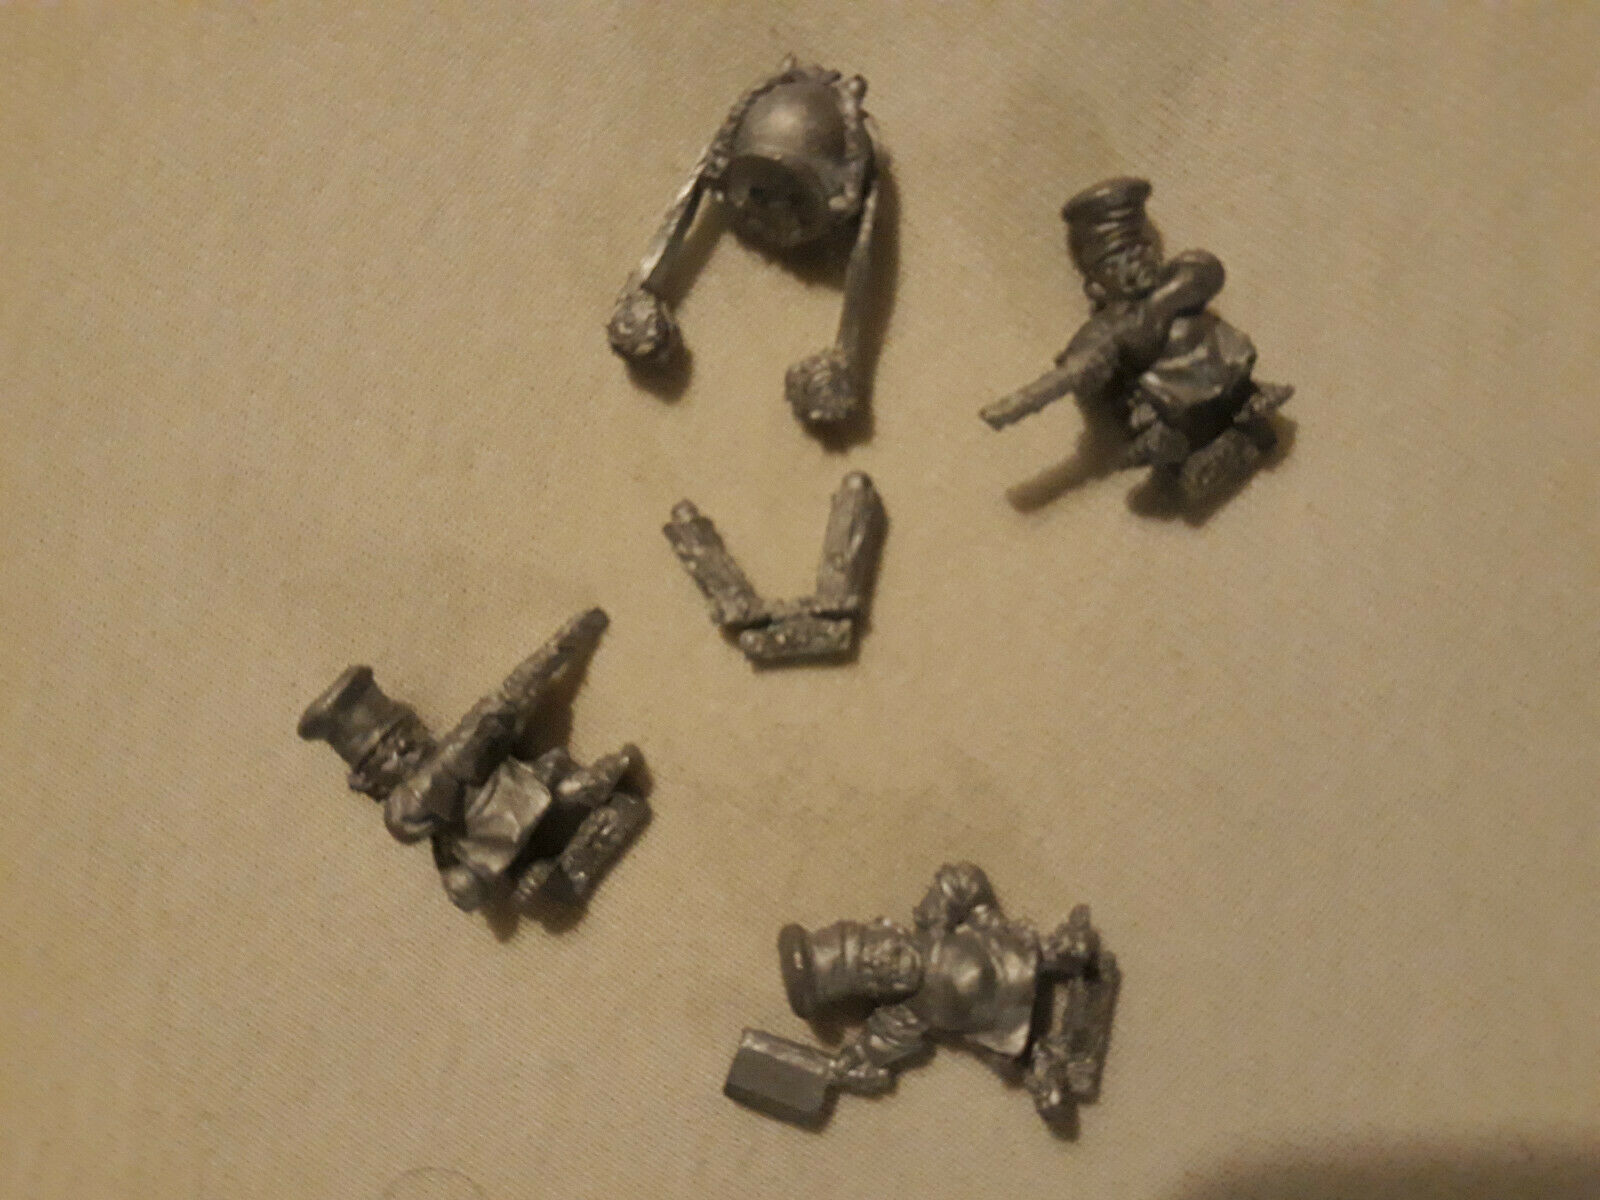 Warhammer halfling dogs of war catapult hot pot crew